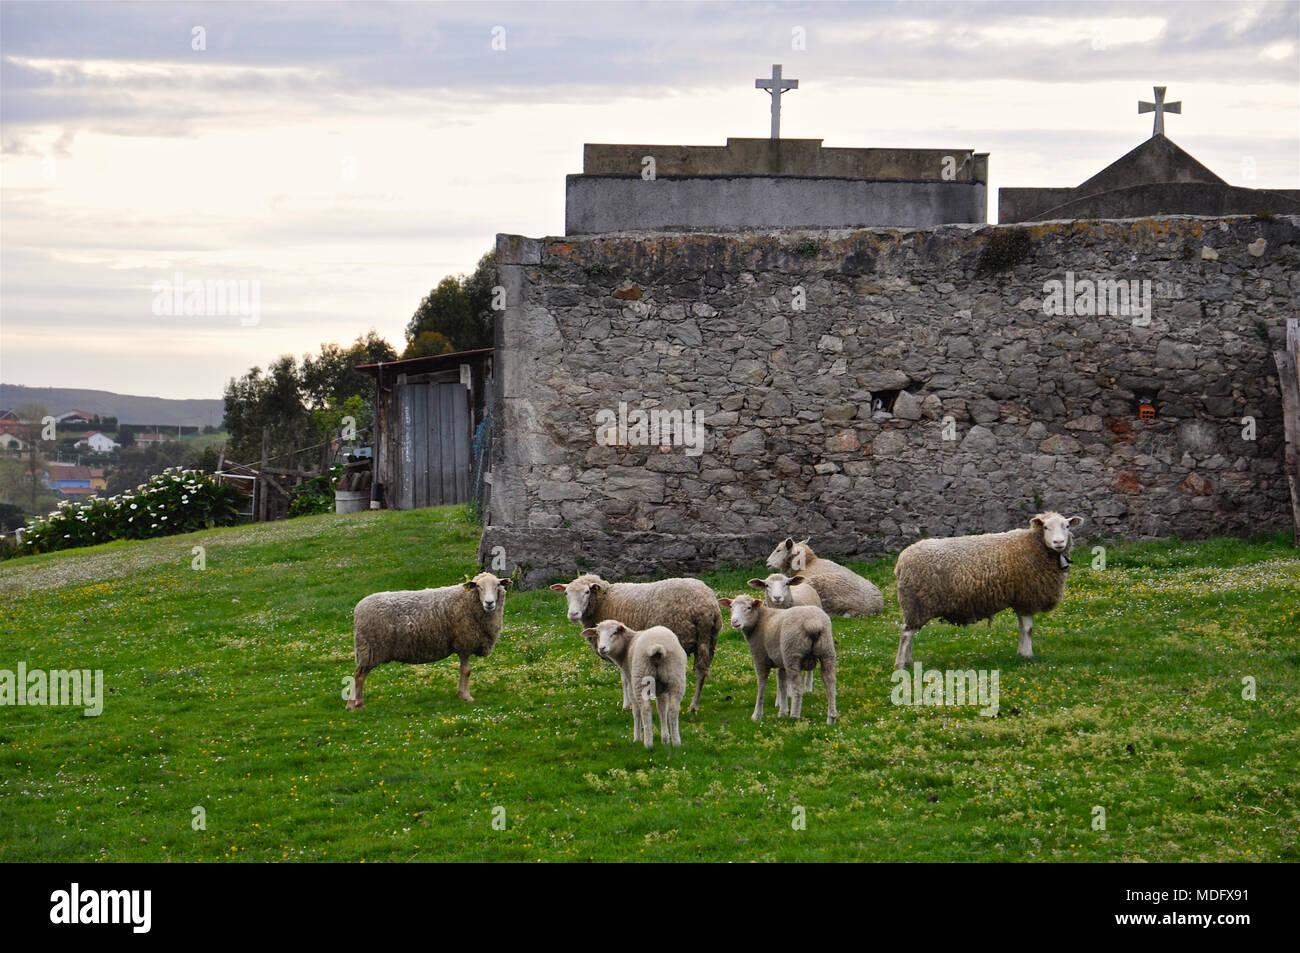 Flock of sheep in a green field next to the cemetery in San Martín de Laspra (Castrillón, Asturias, Spain) - Stock Image